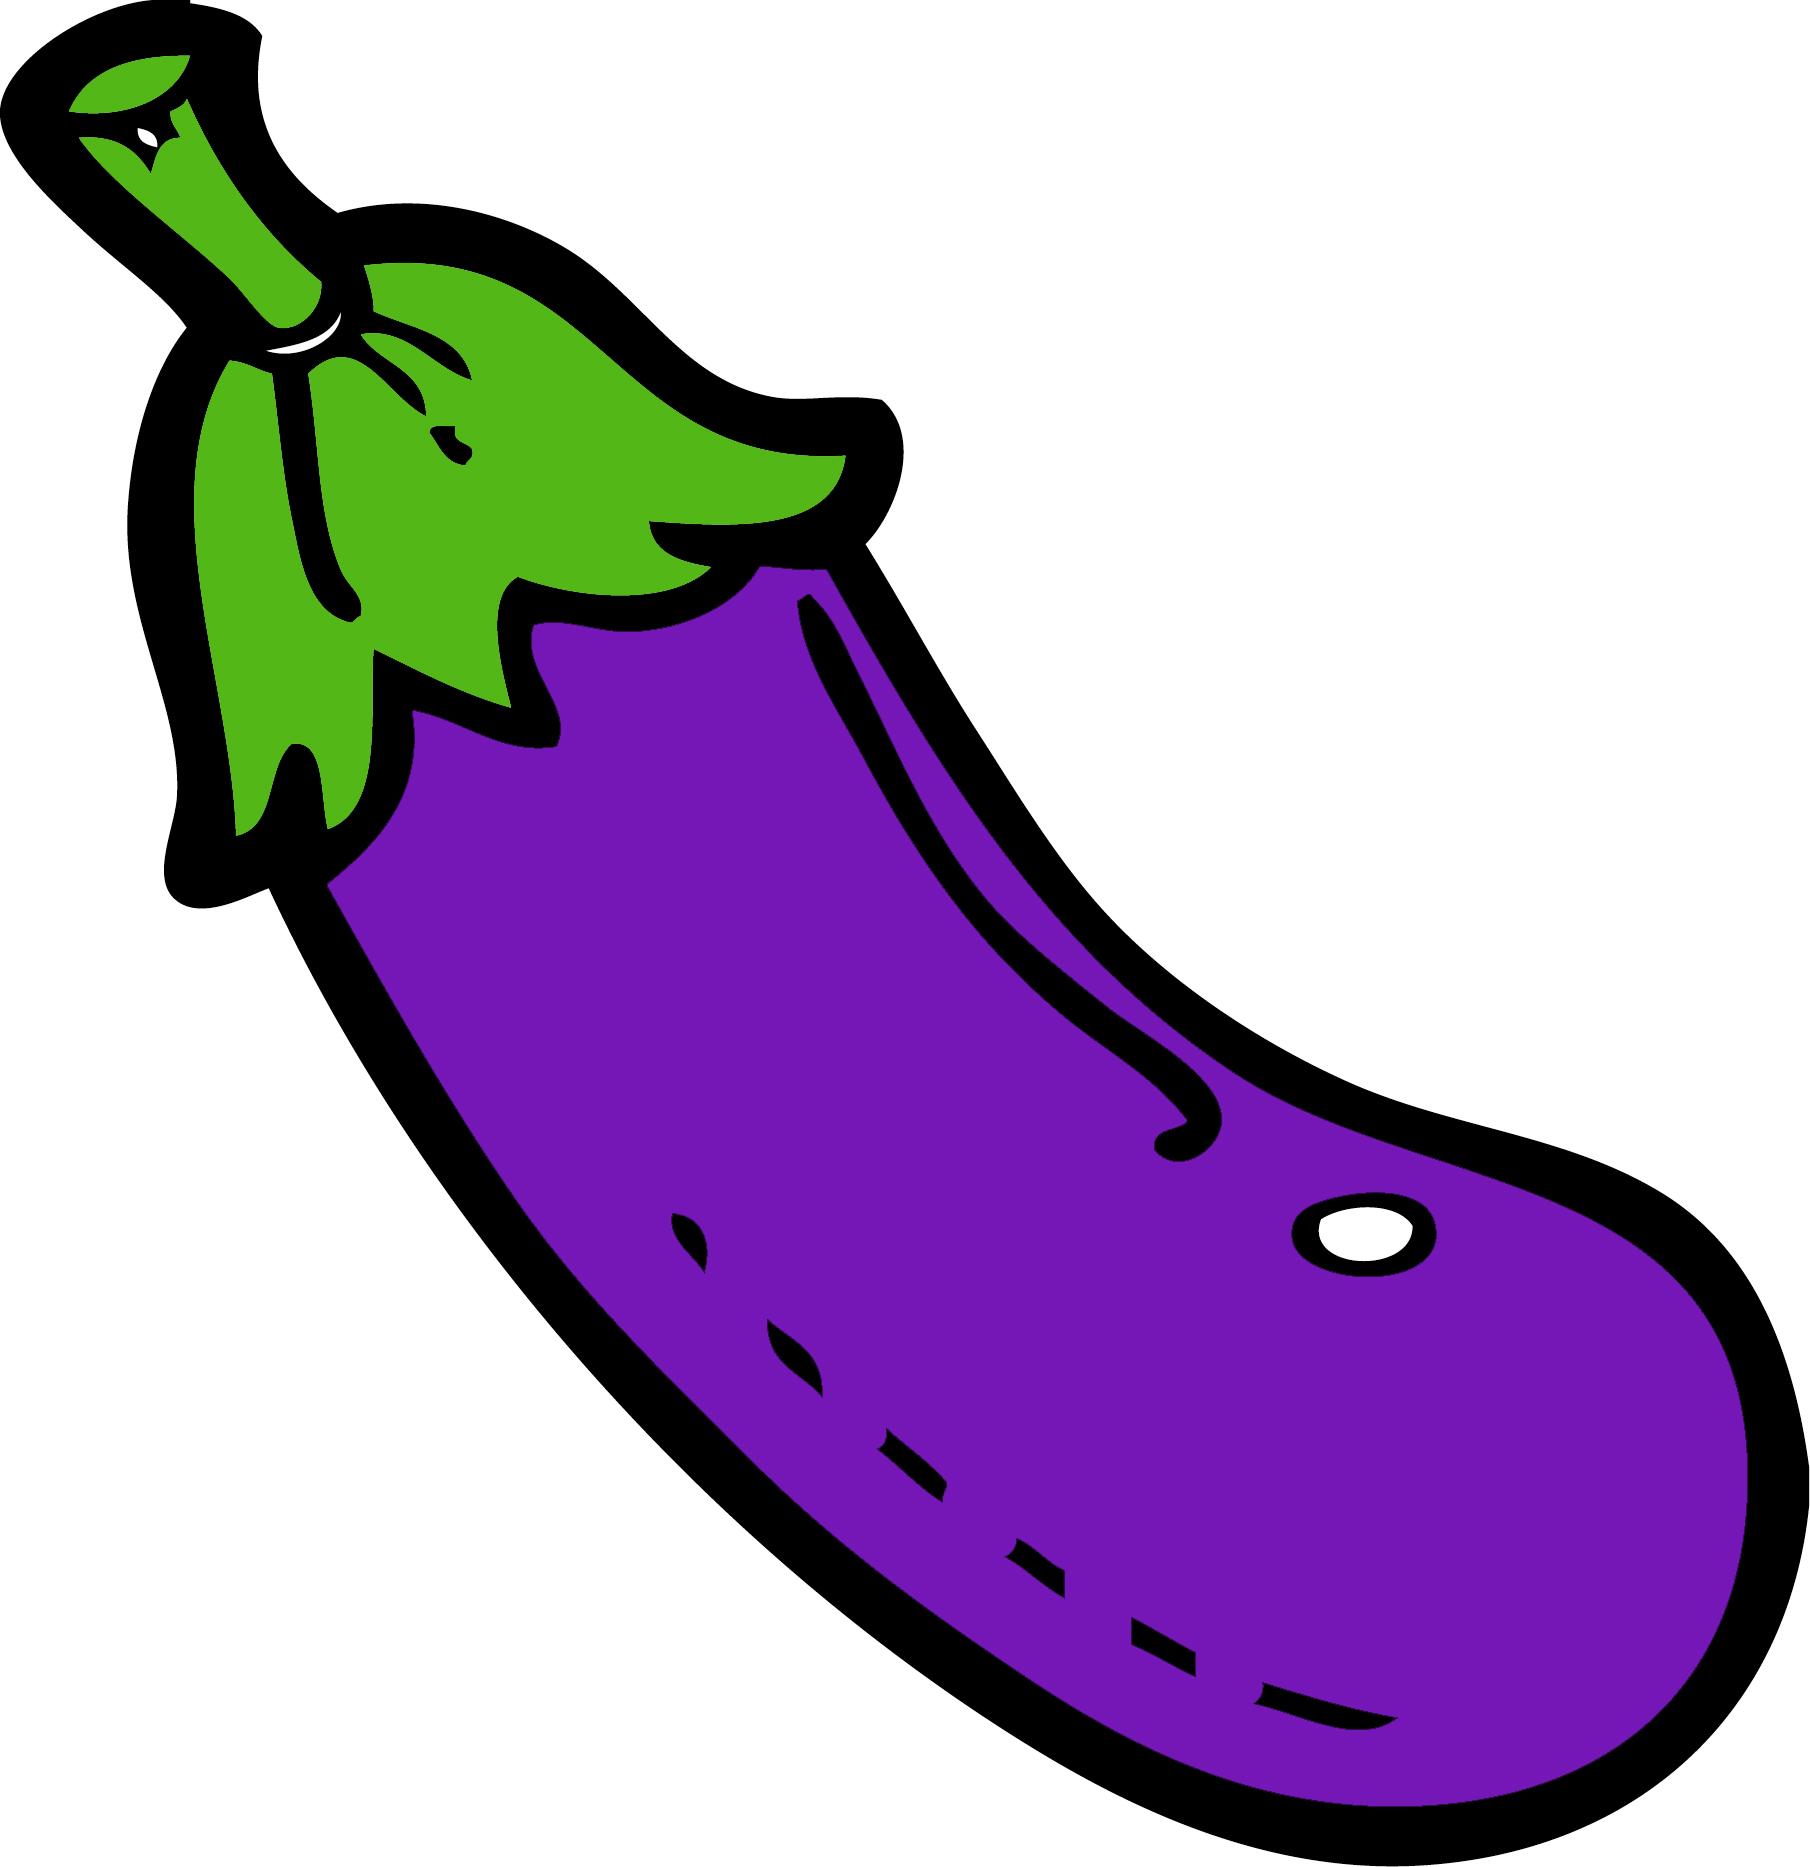 Eggplant clipart Cliparts Clipart Cartoon Vegetable